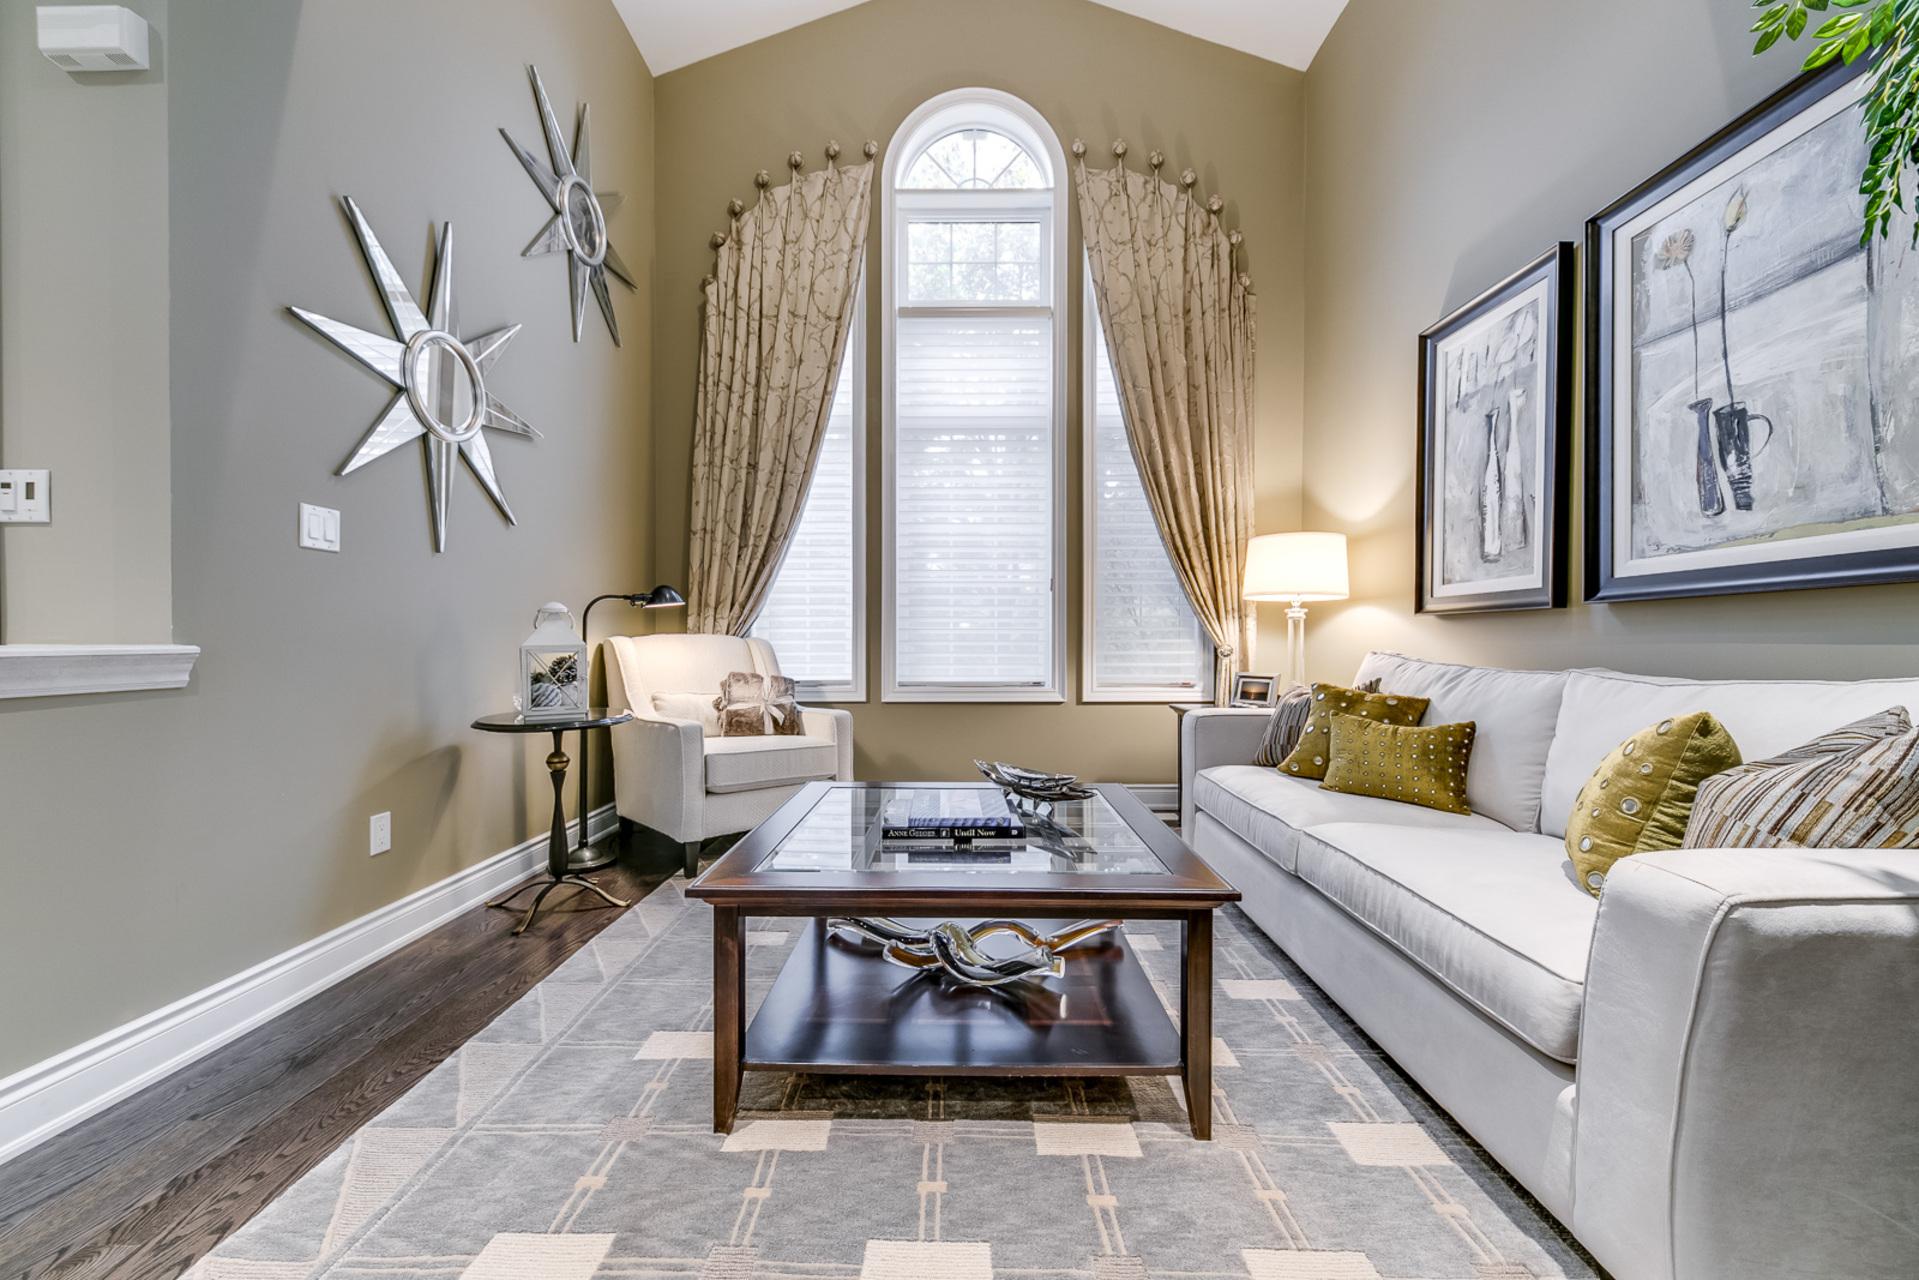 Living Room - 2460 Bon Echo Dr, Oakville - Elite3 & Team at 2460 Bon Echo Drive, Iroquois Ridge North, Oakville